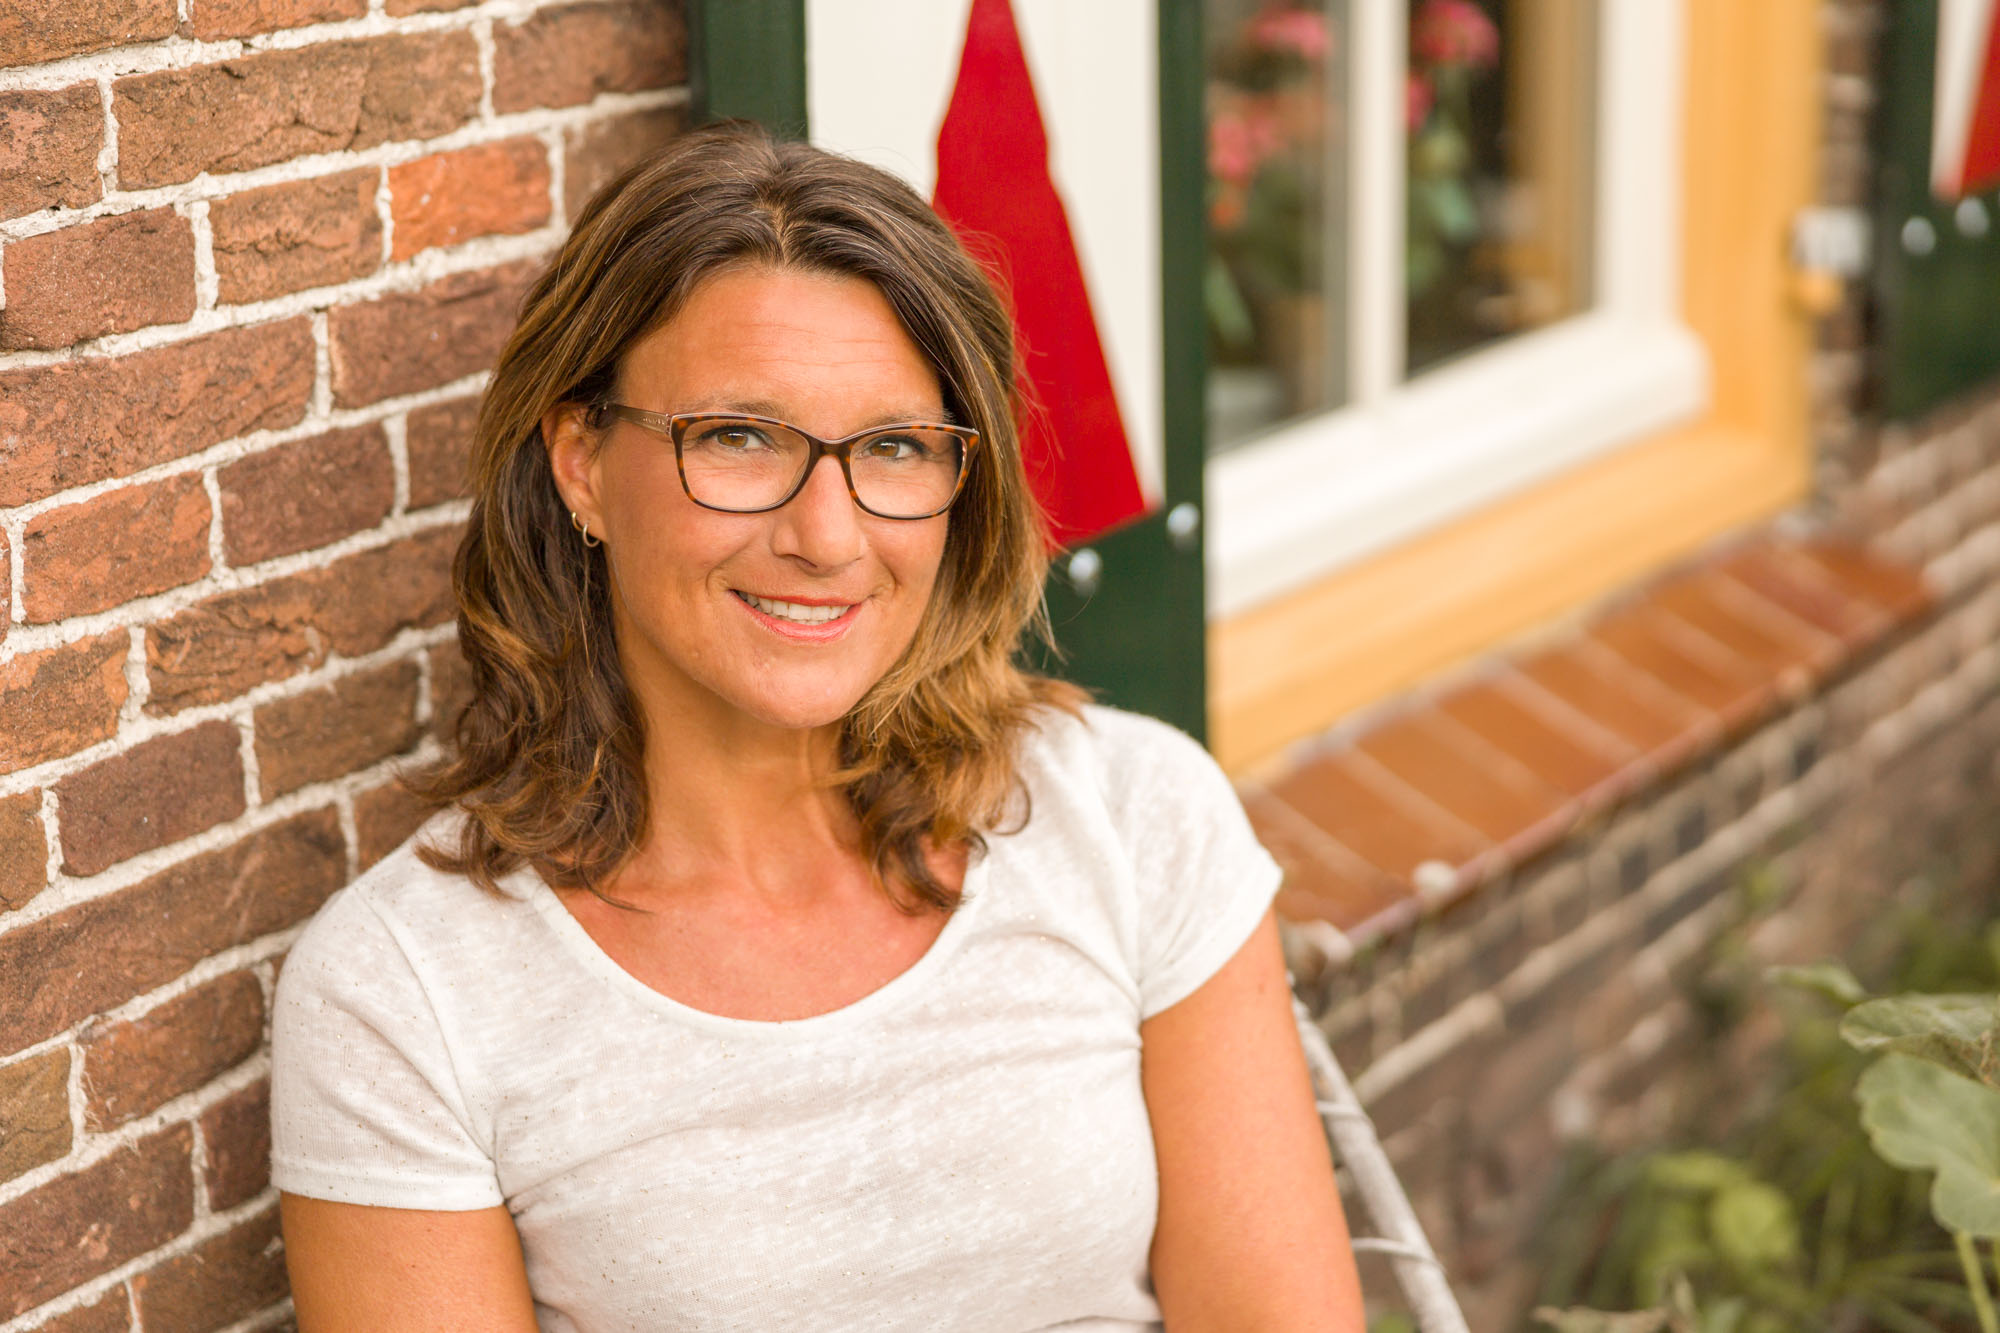 Portretfotograaf in Amersfoort, Nijkerk, Hoevelaken. Portret. Portretfotografie. Mayra Fotografie